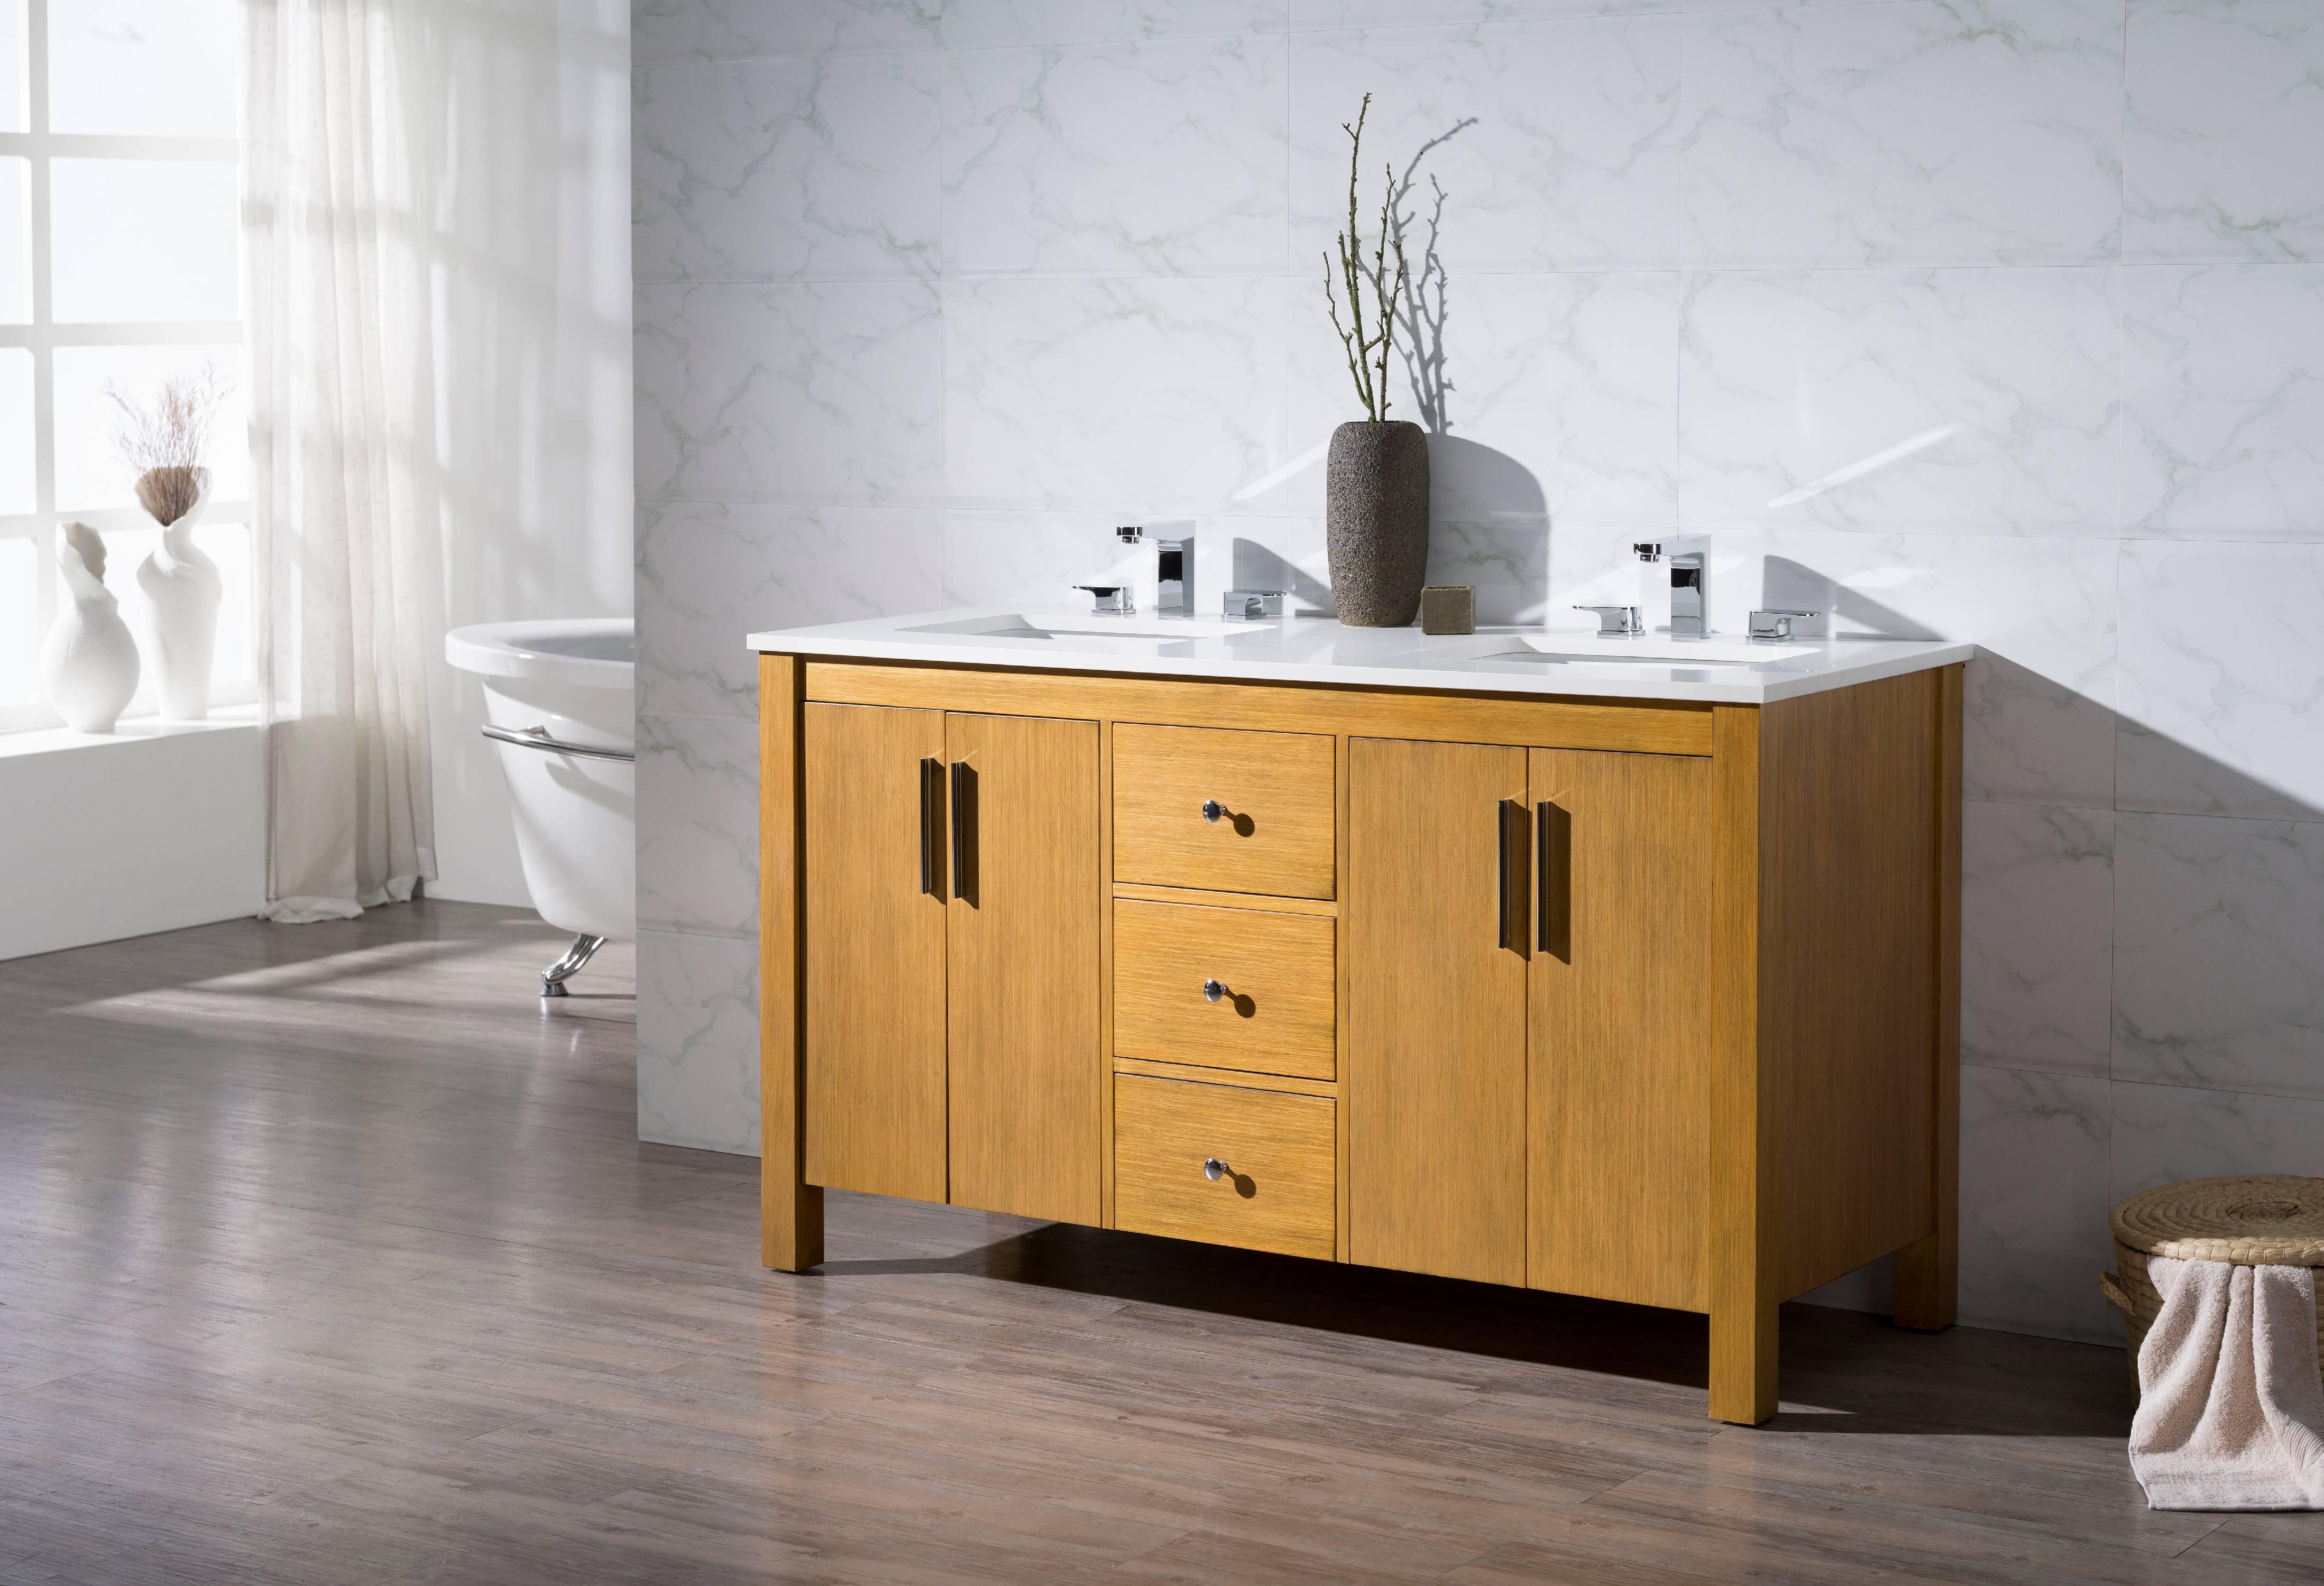 About this item. Windsor 59 Inch Double Sink Bathroom Vanity   Walmart com